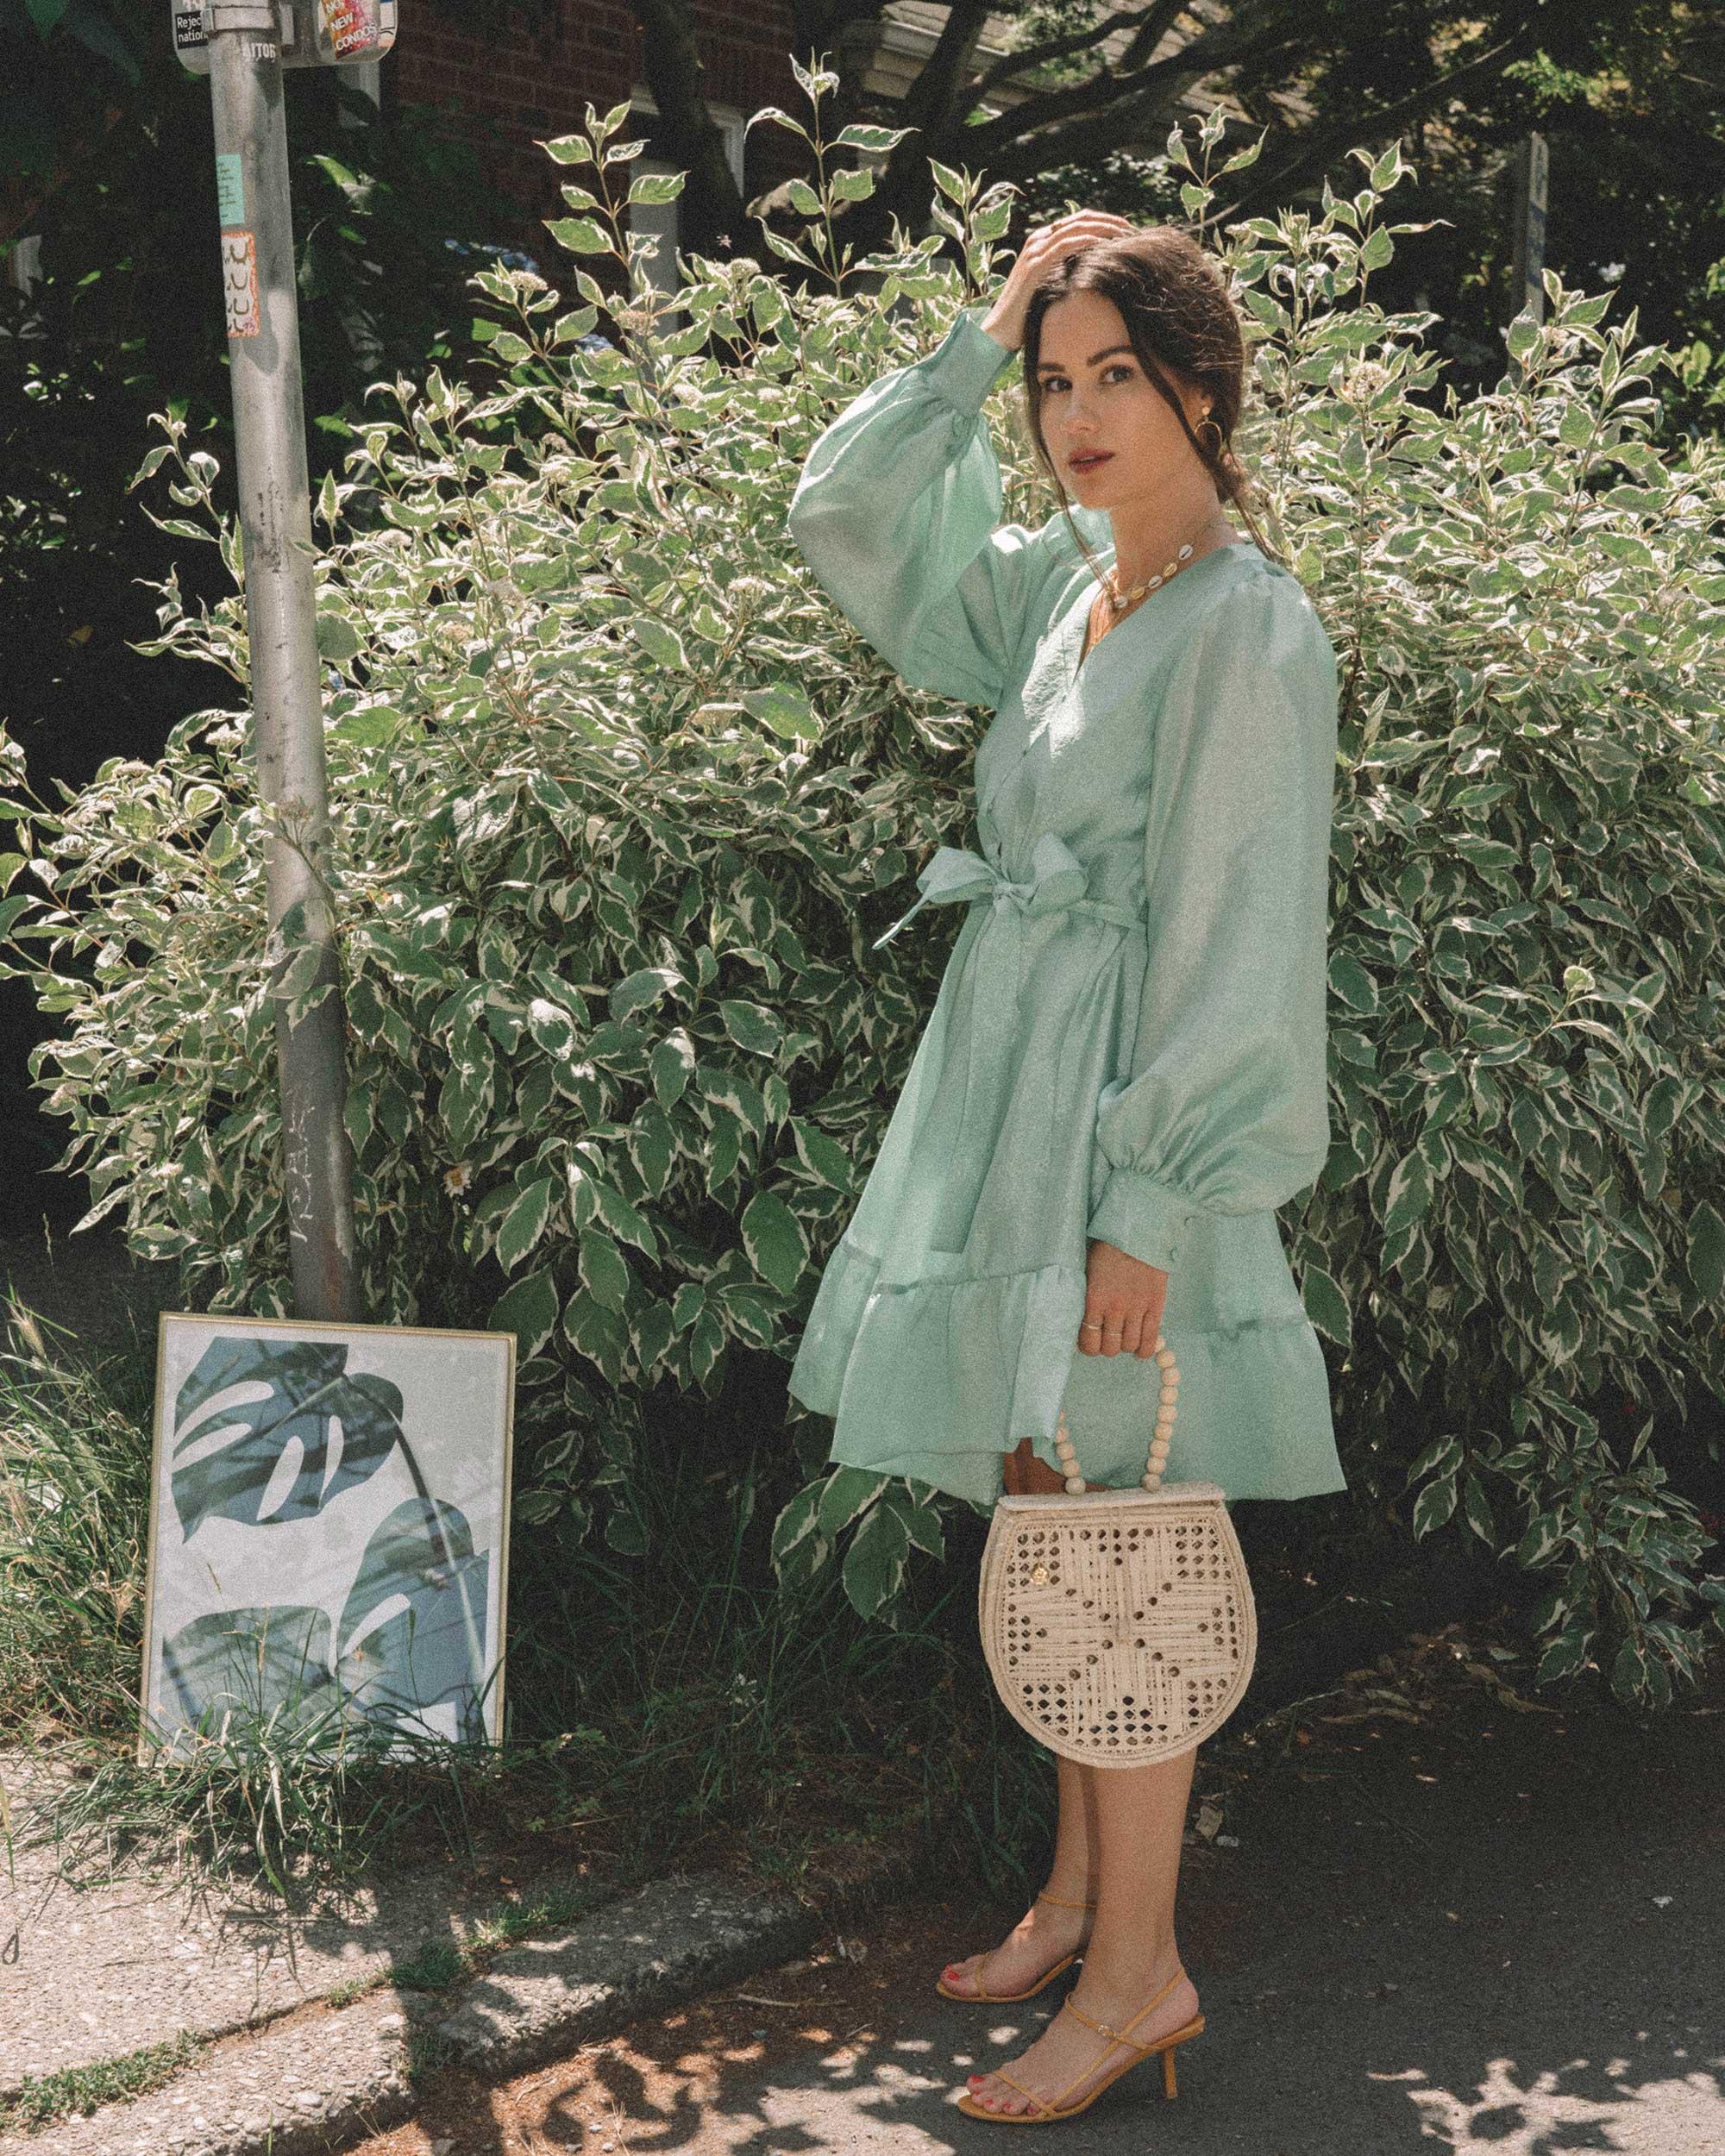 STINE GOYA Farrow Crepe Blouson Sleeve Dress in jade green satin crepe - 15.jpg